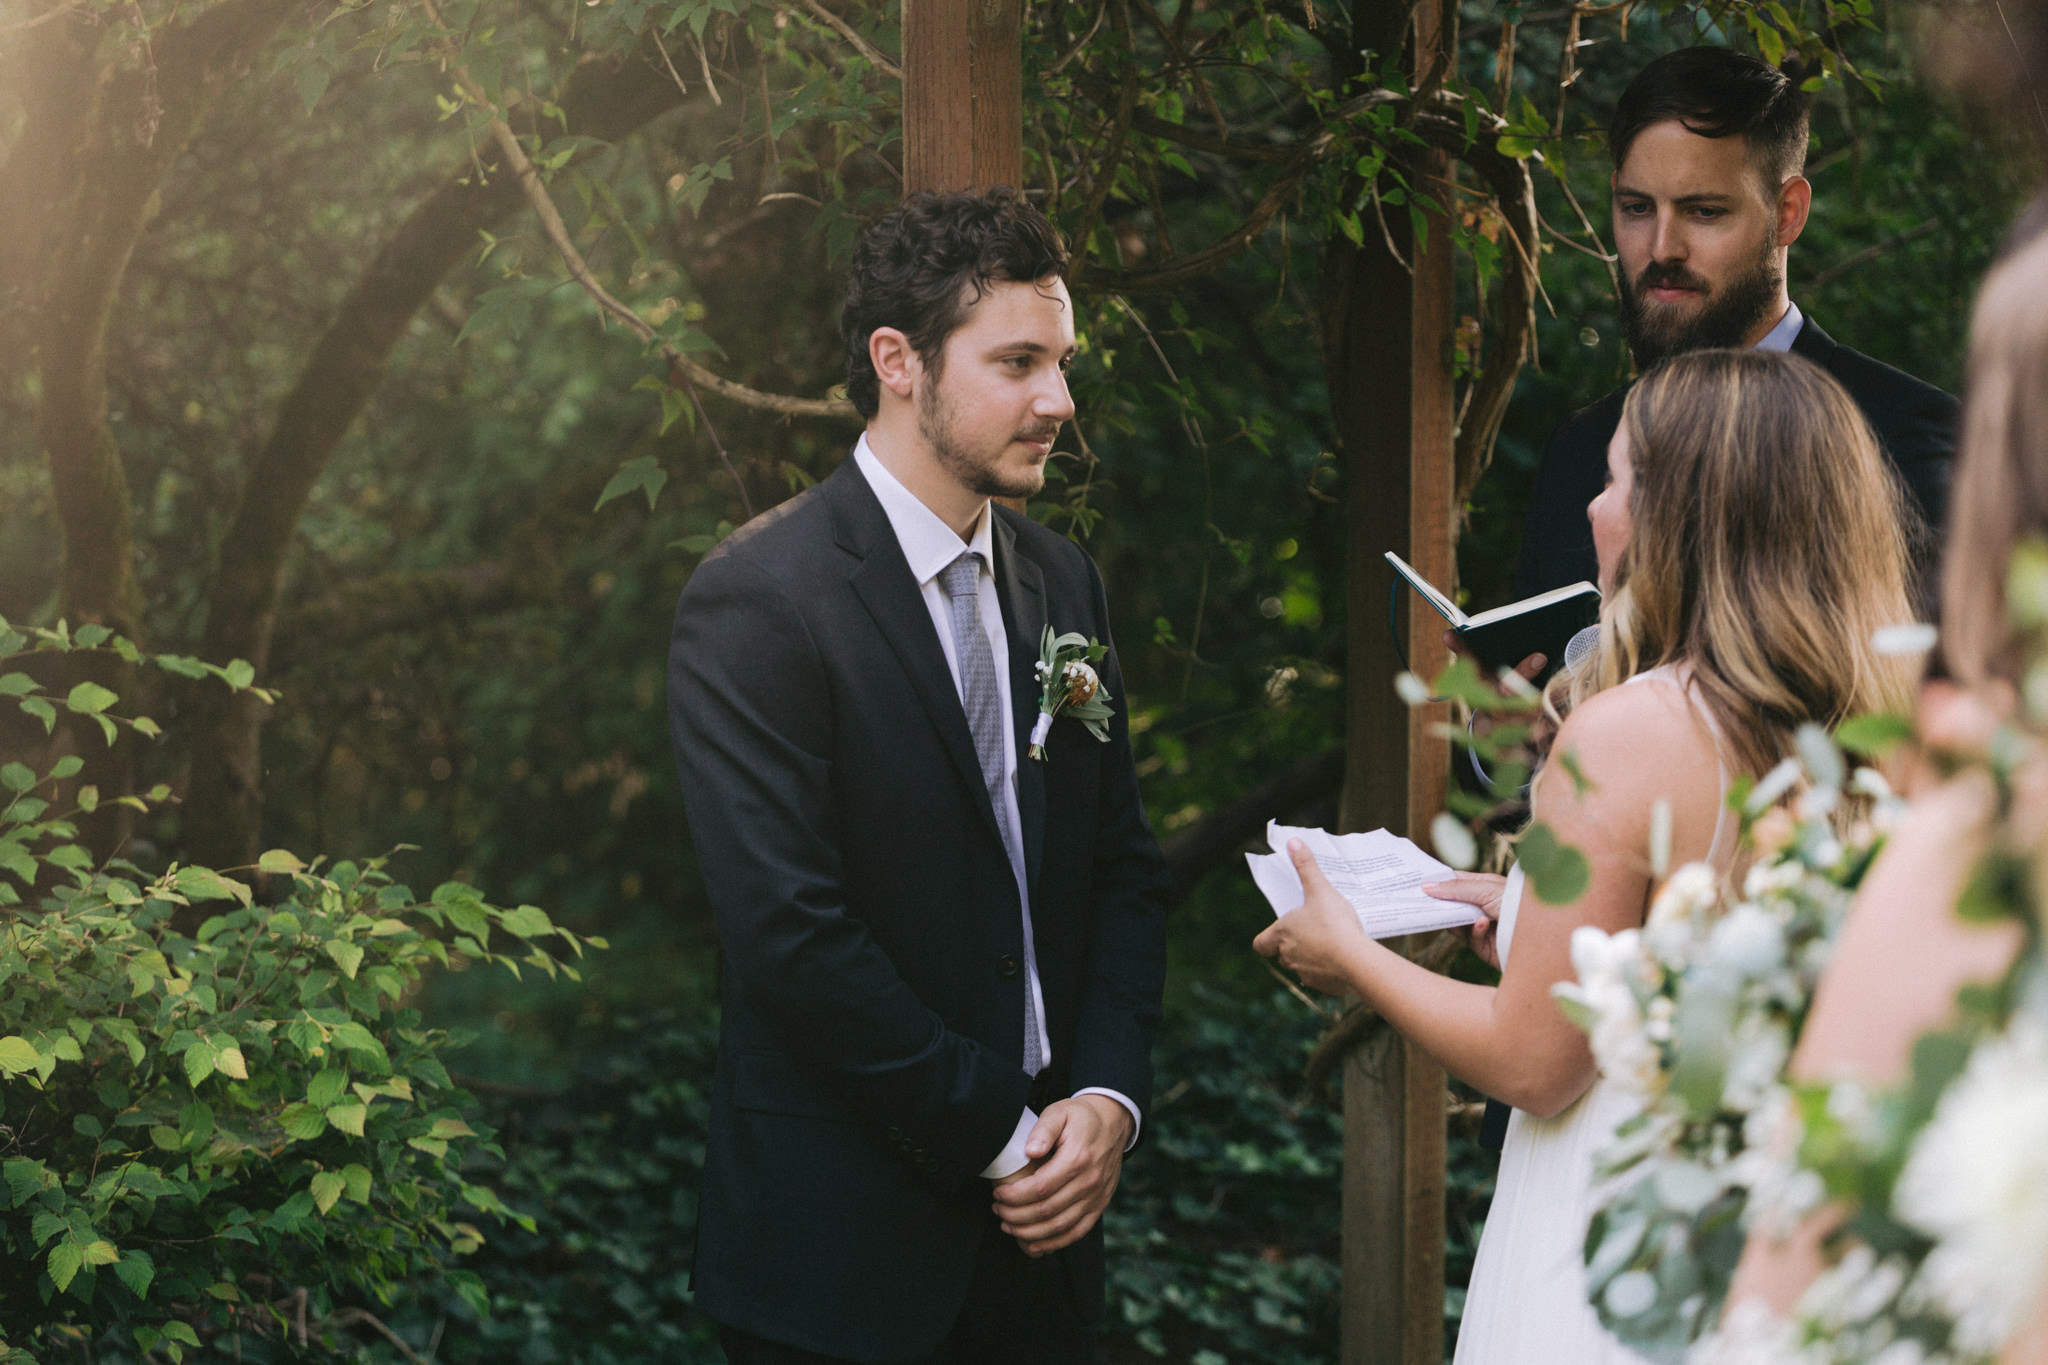 Backyard-Bainbridge-Island-Wedding-Alycia-Lovell-Photography-110.JPG